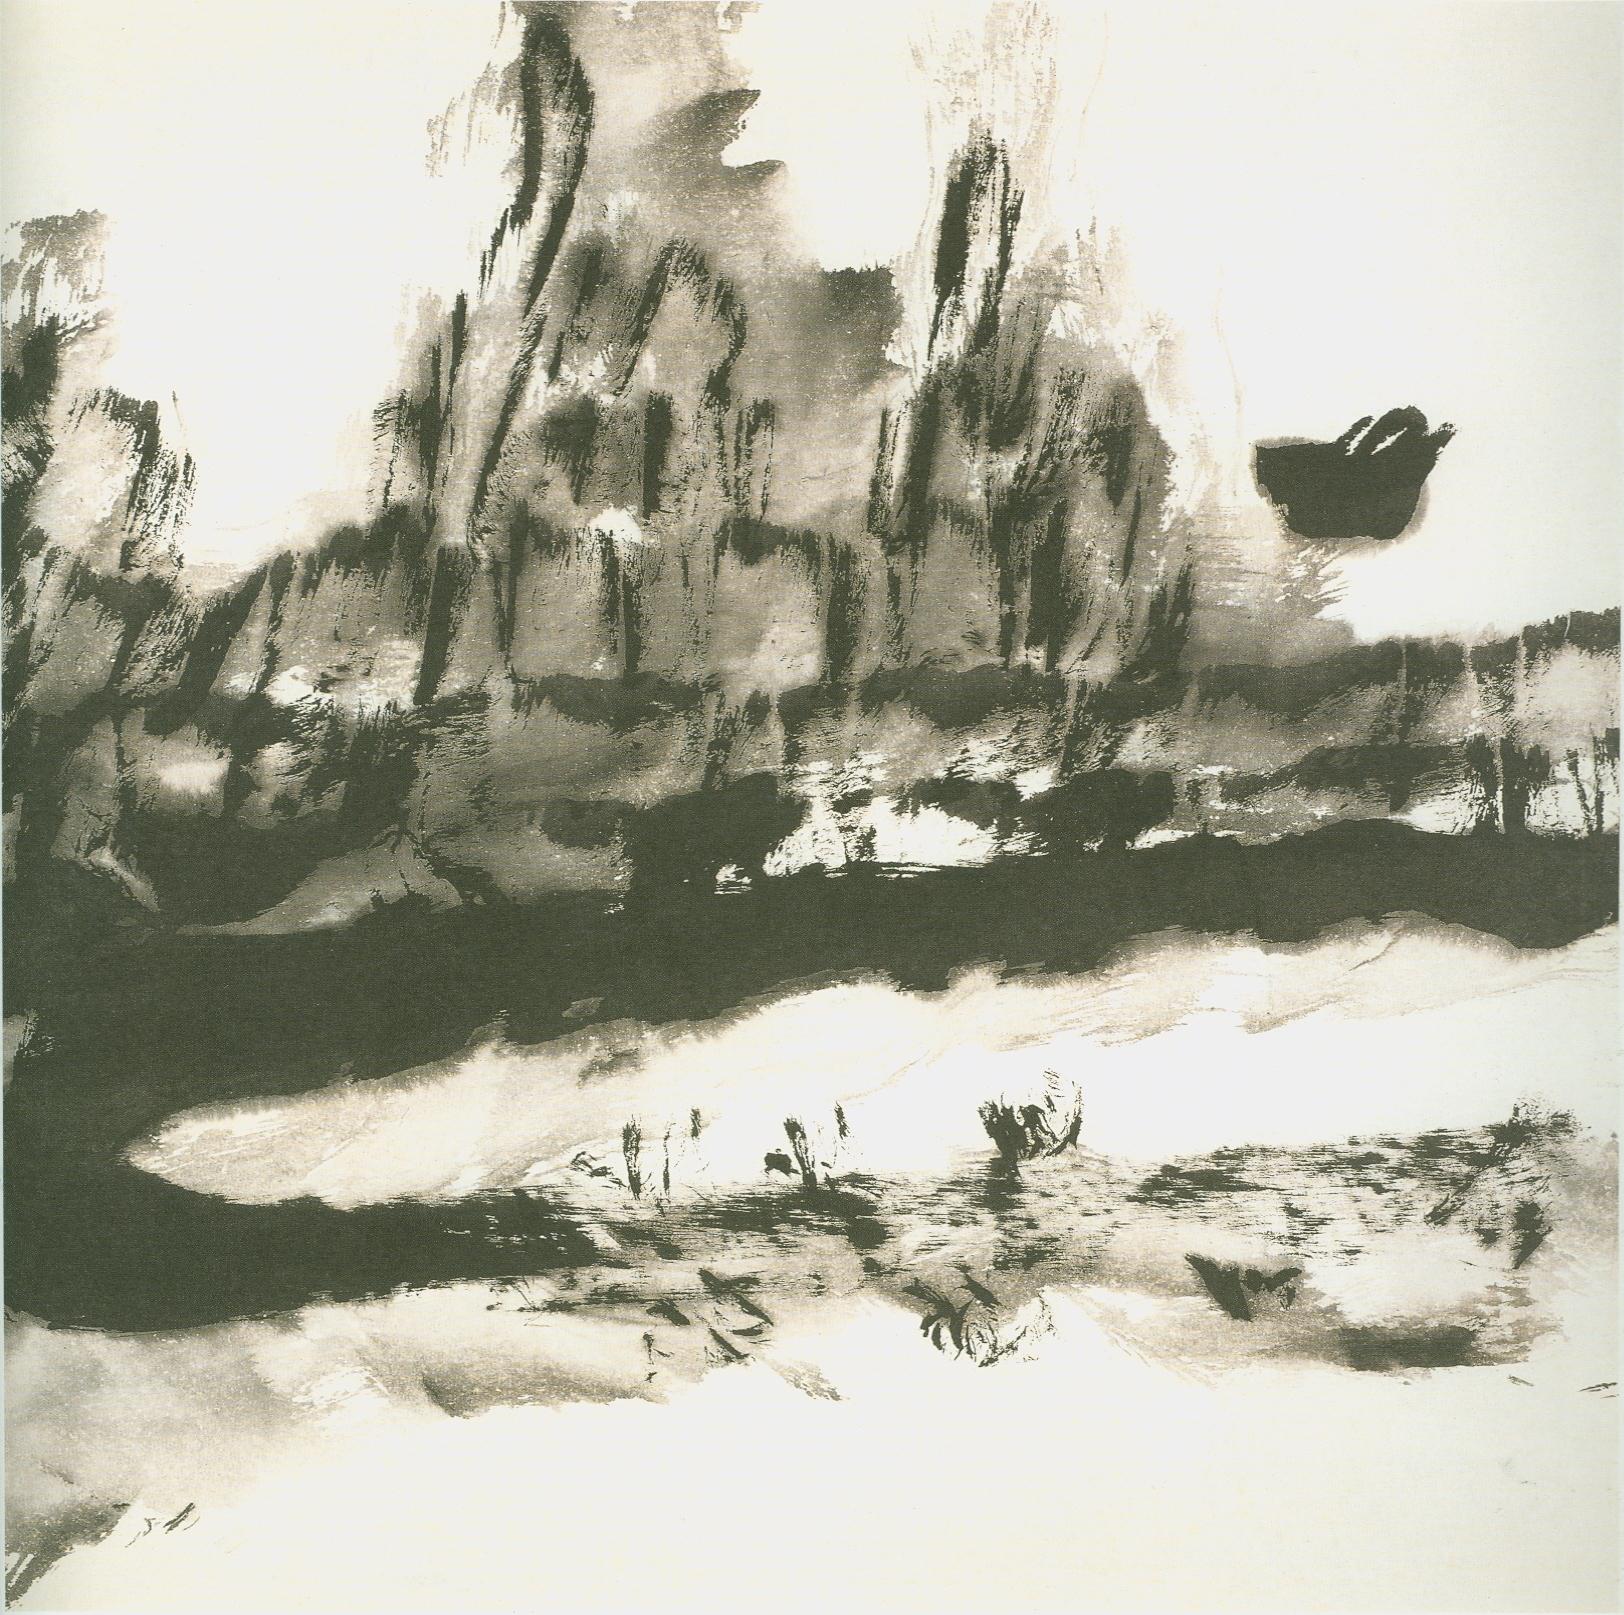 SAM Art: An overlooked Chinese artist